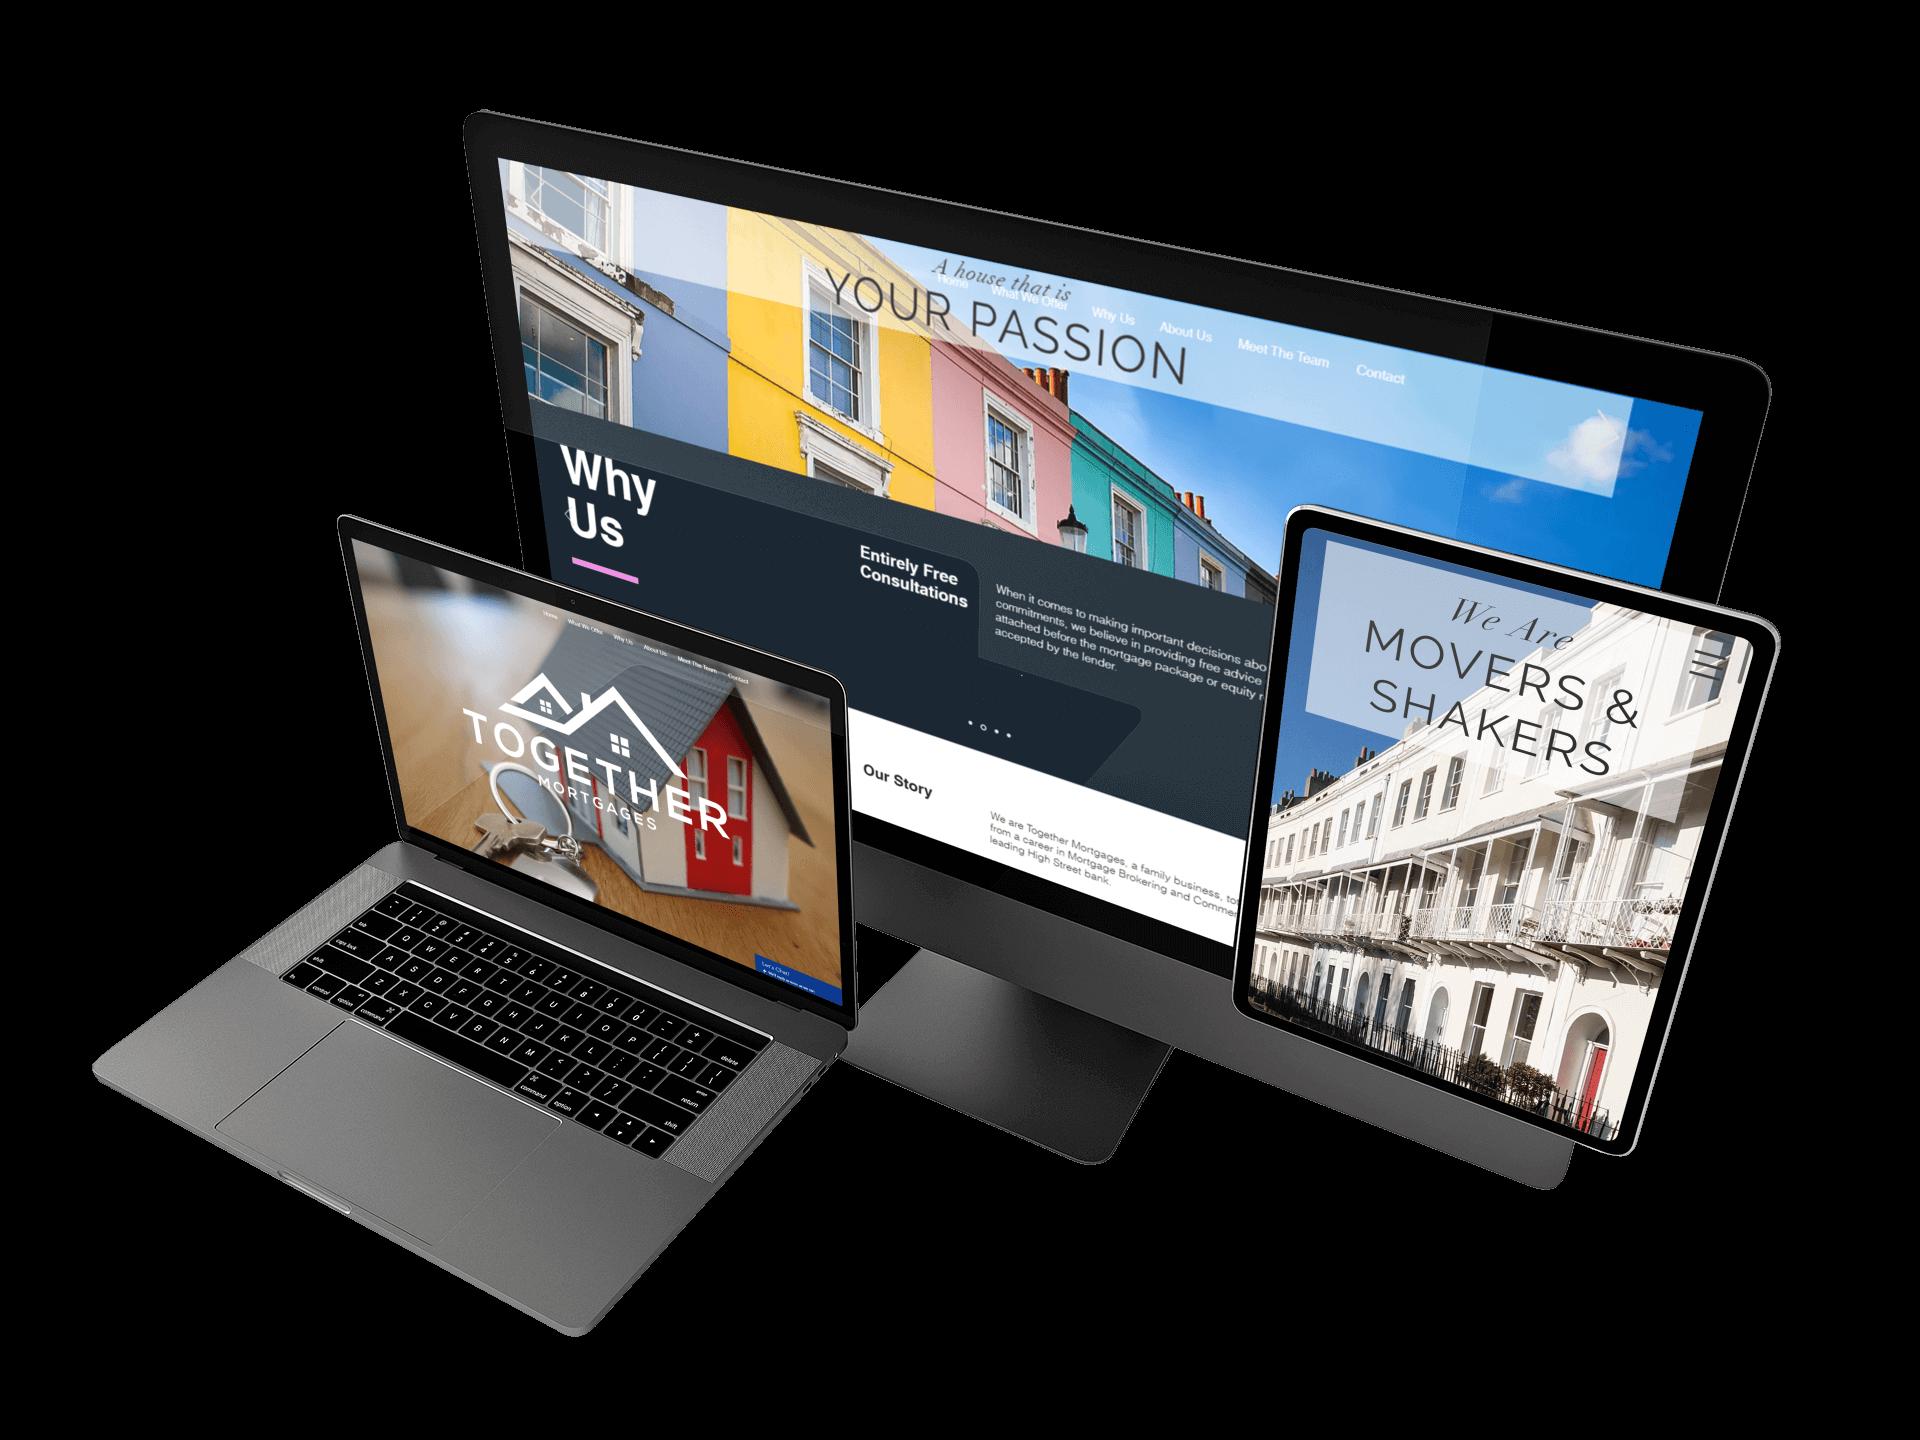 Web Design Weston Super Mare Inspired Works